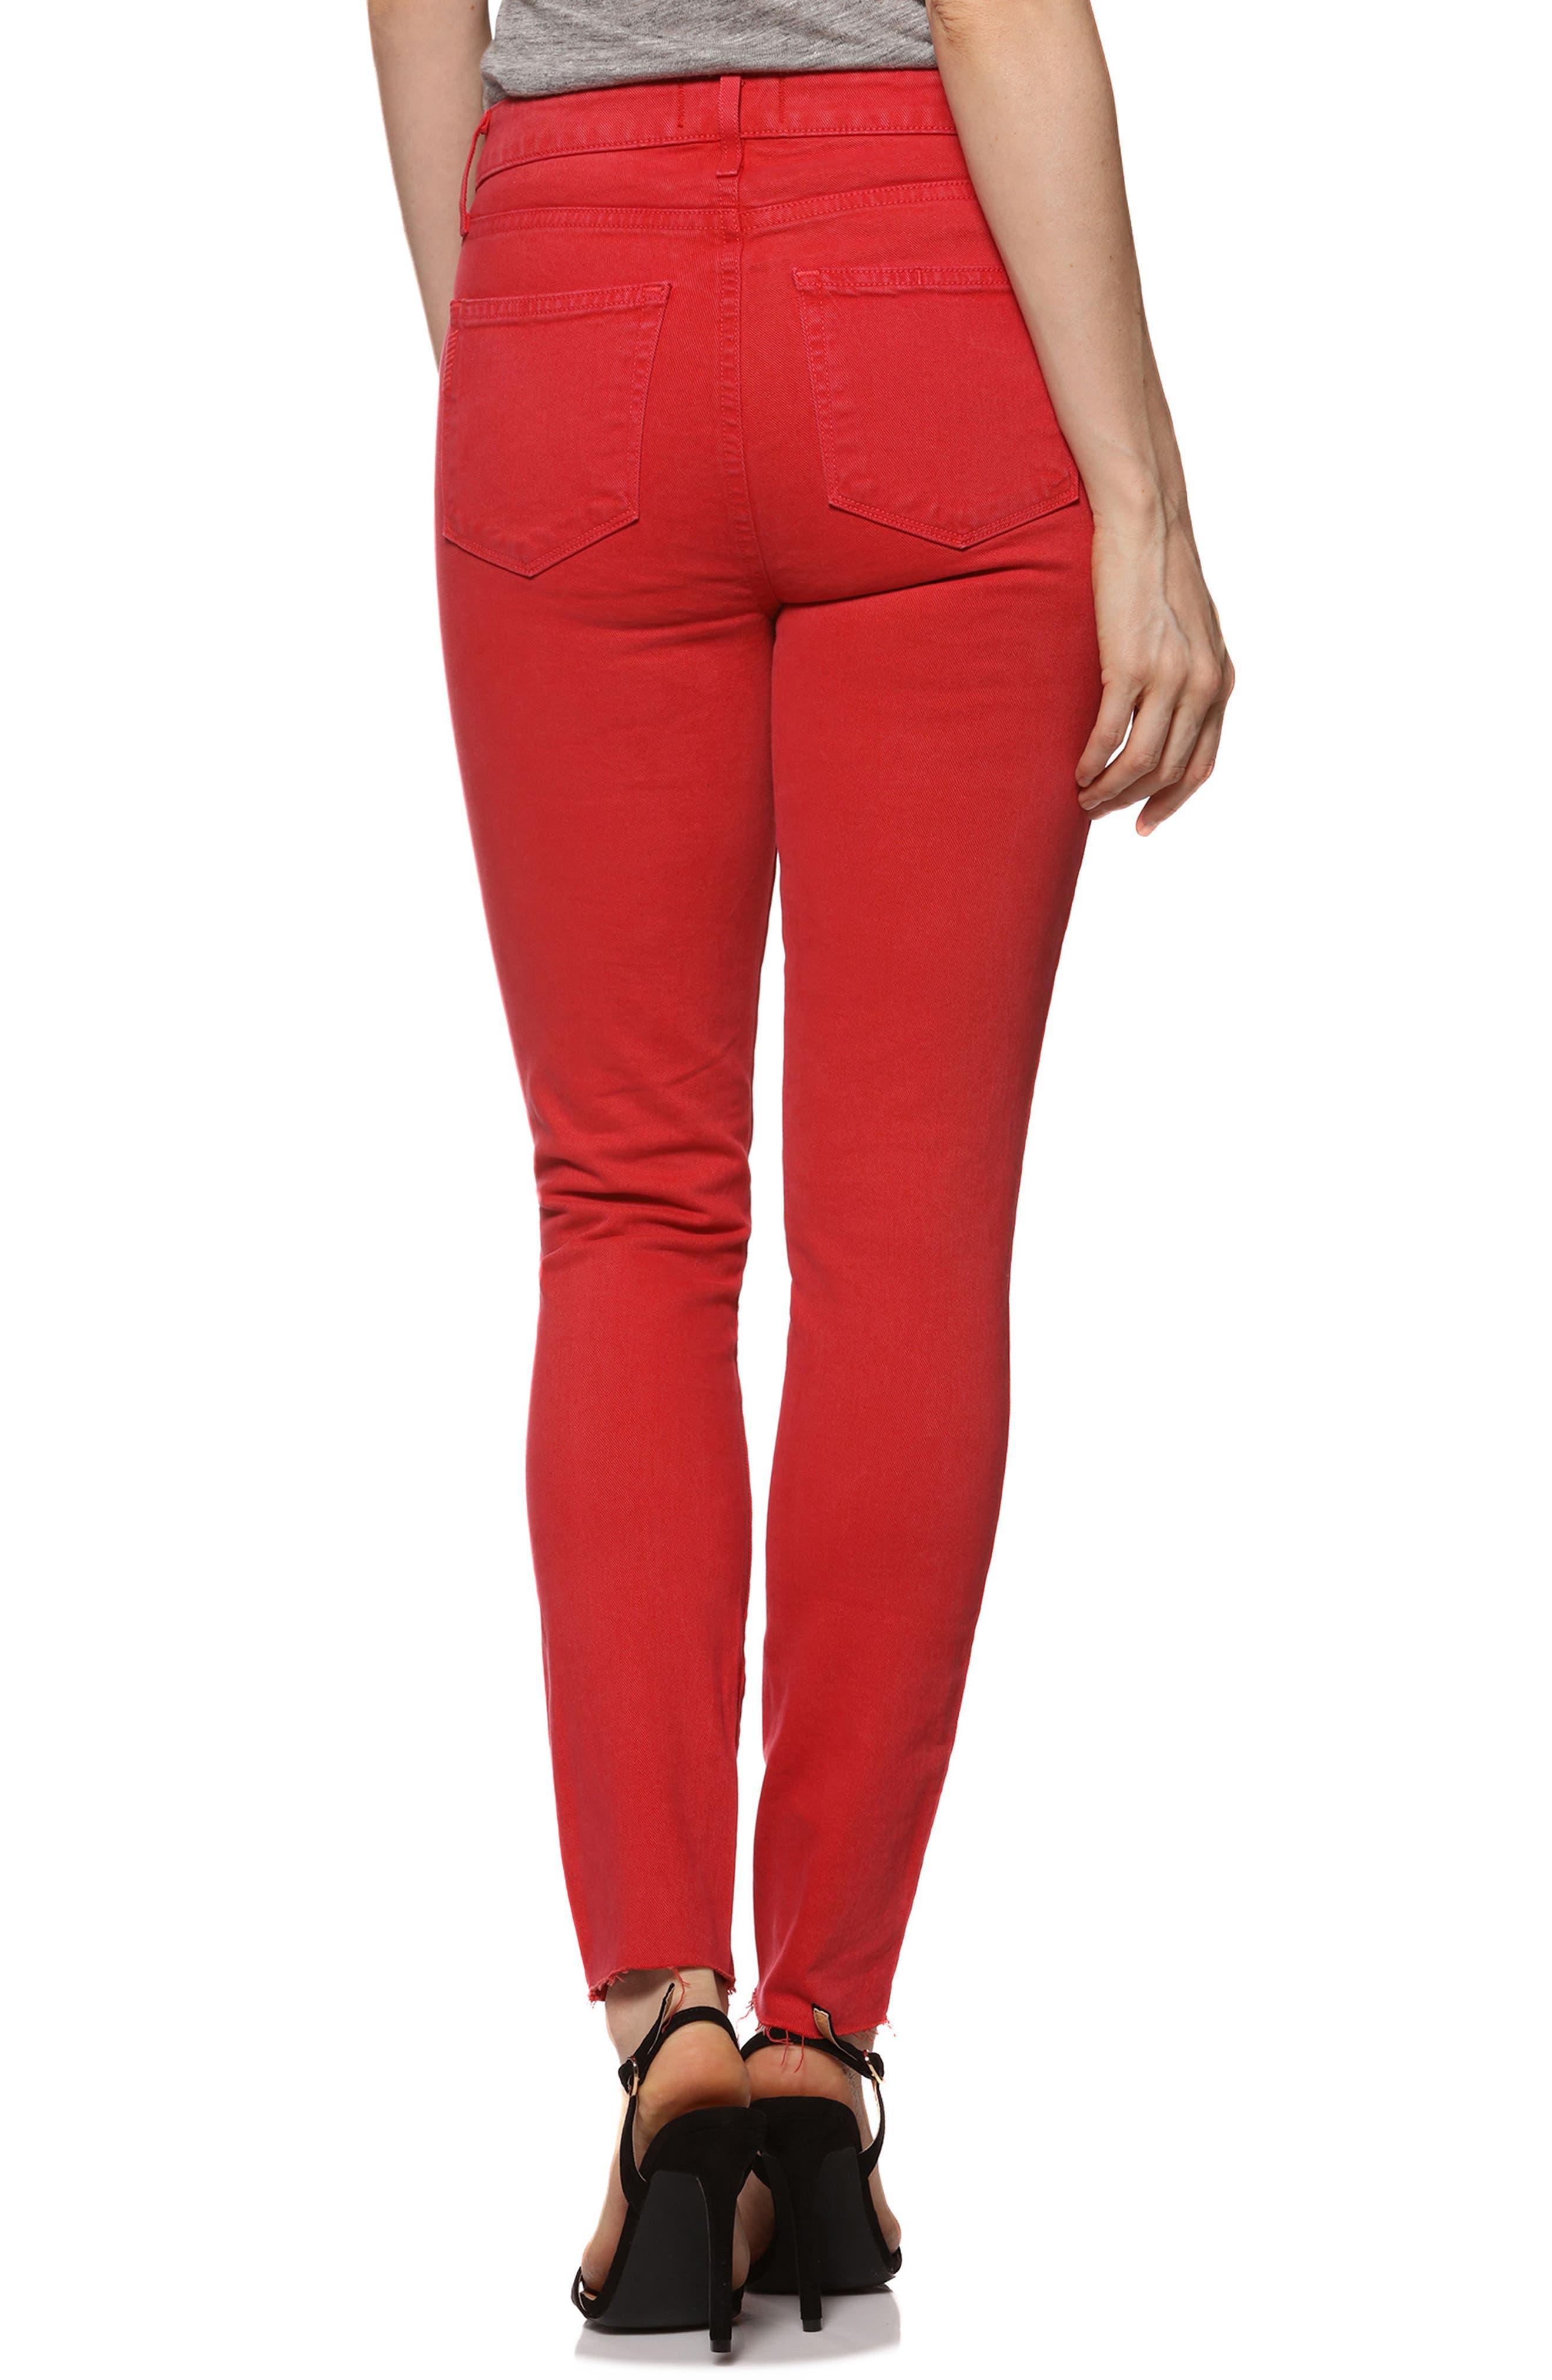 Hoxton High Waist Ankle Skinny Jeans,                             Alternate thumbnail 2, color,                             649